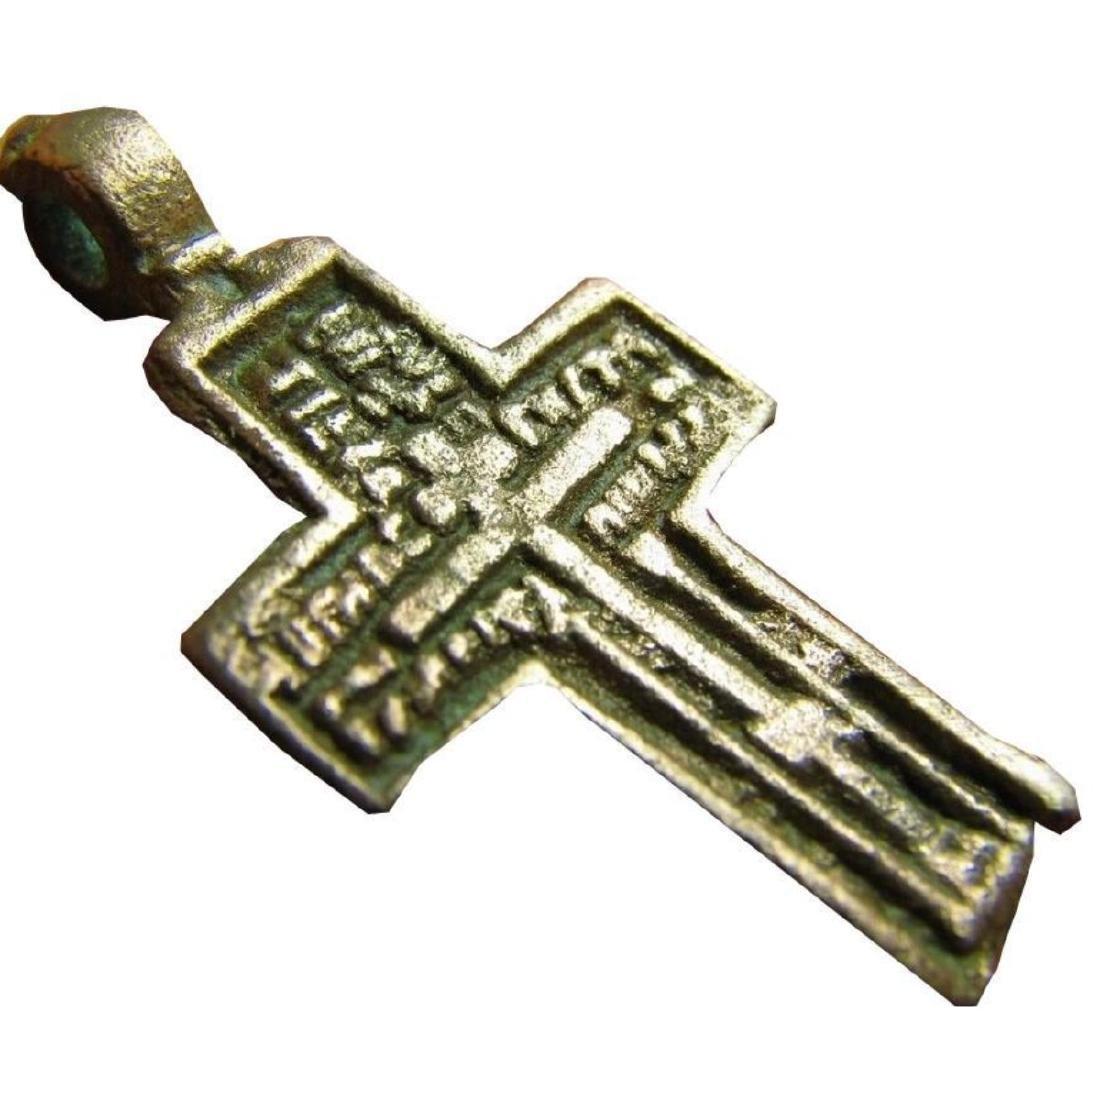 Prayer Big Relief Late Medieval Church Bronze Cross - 3